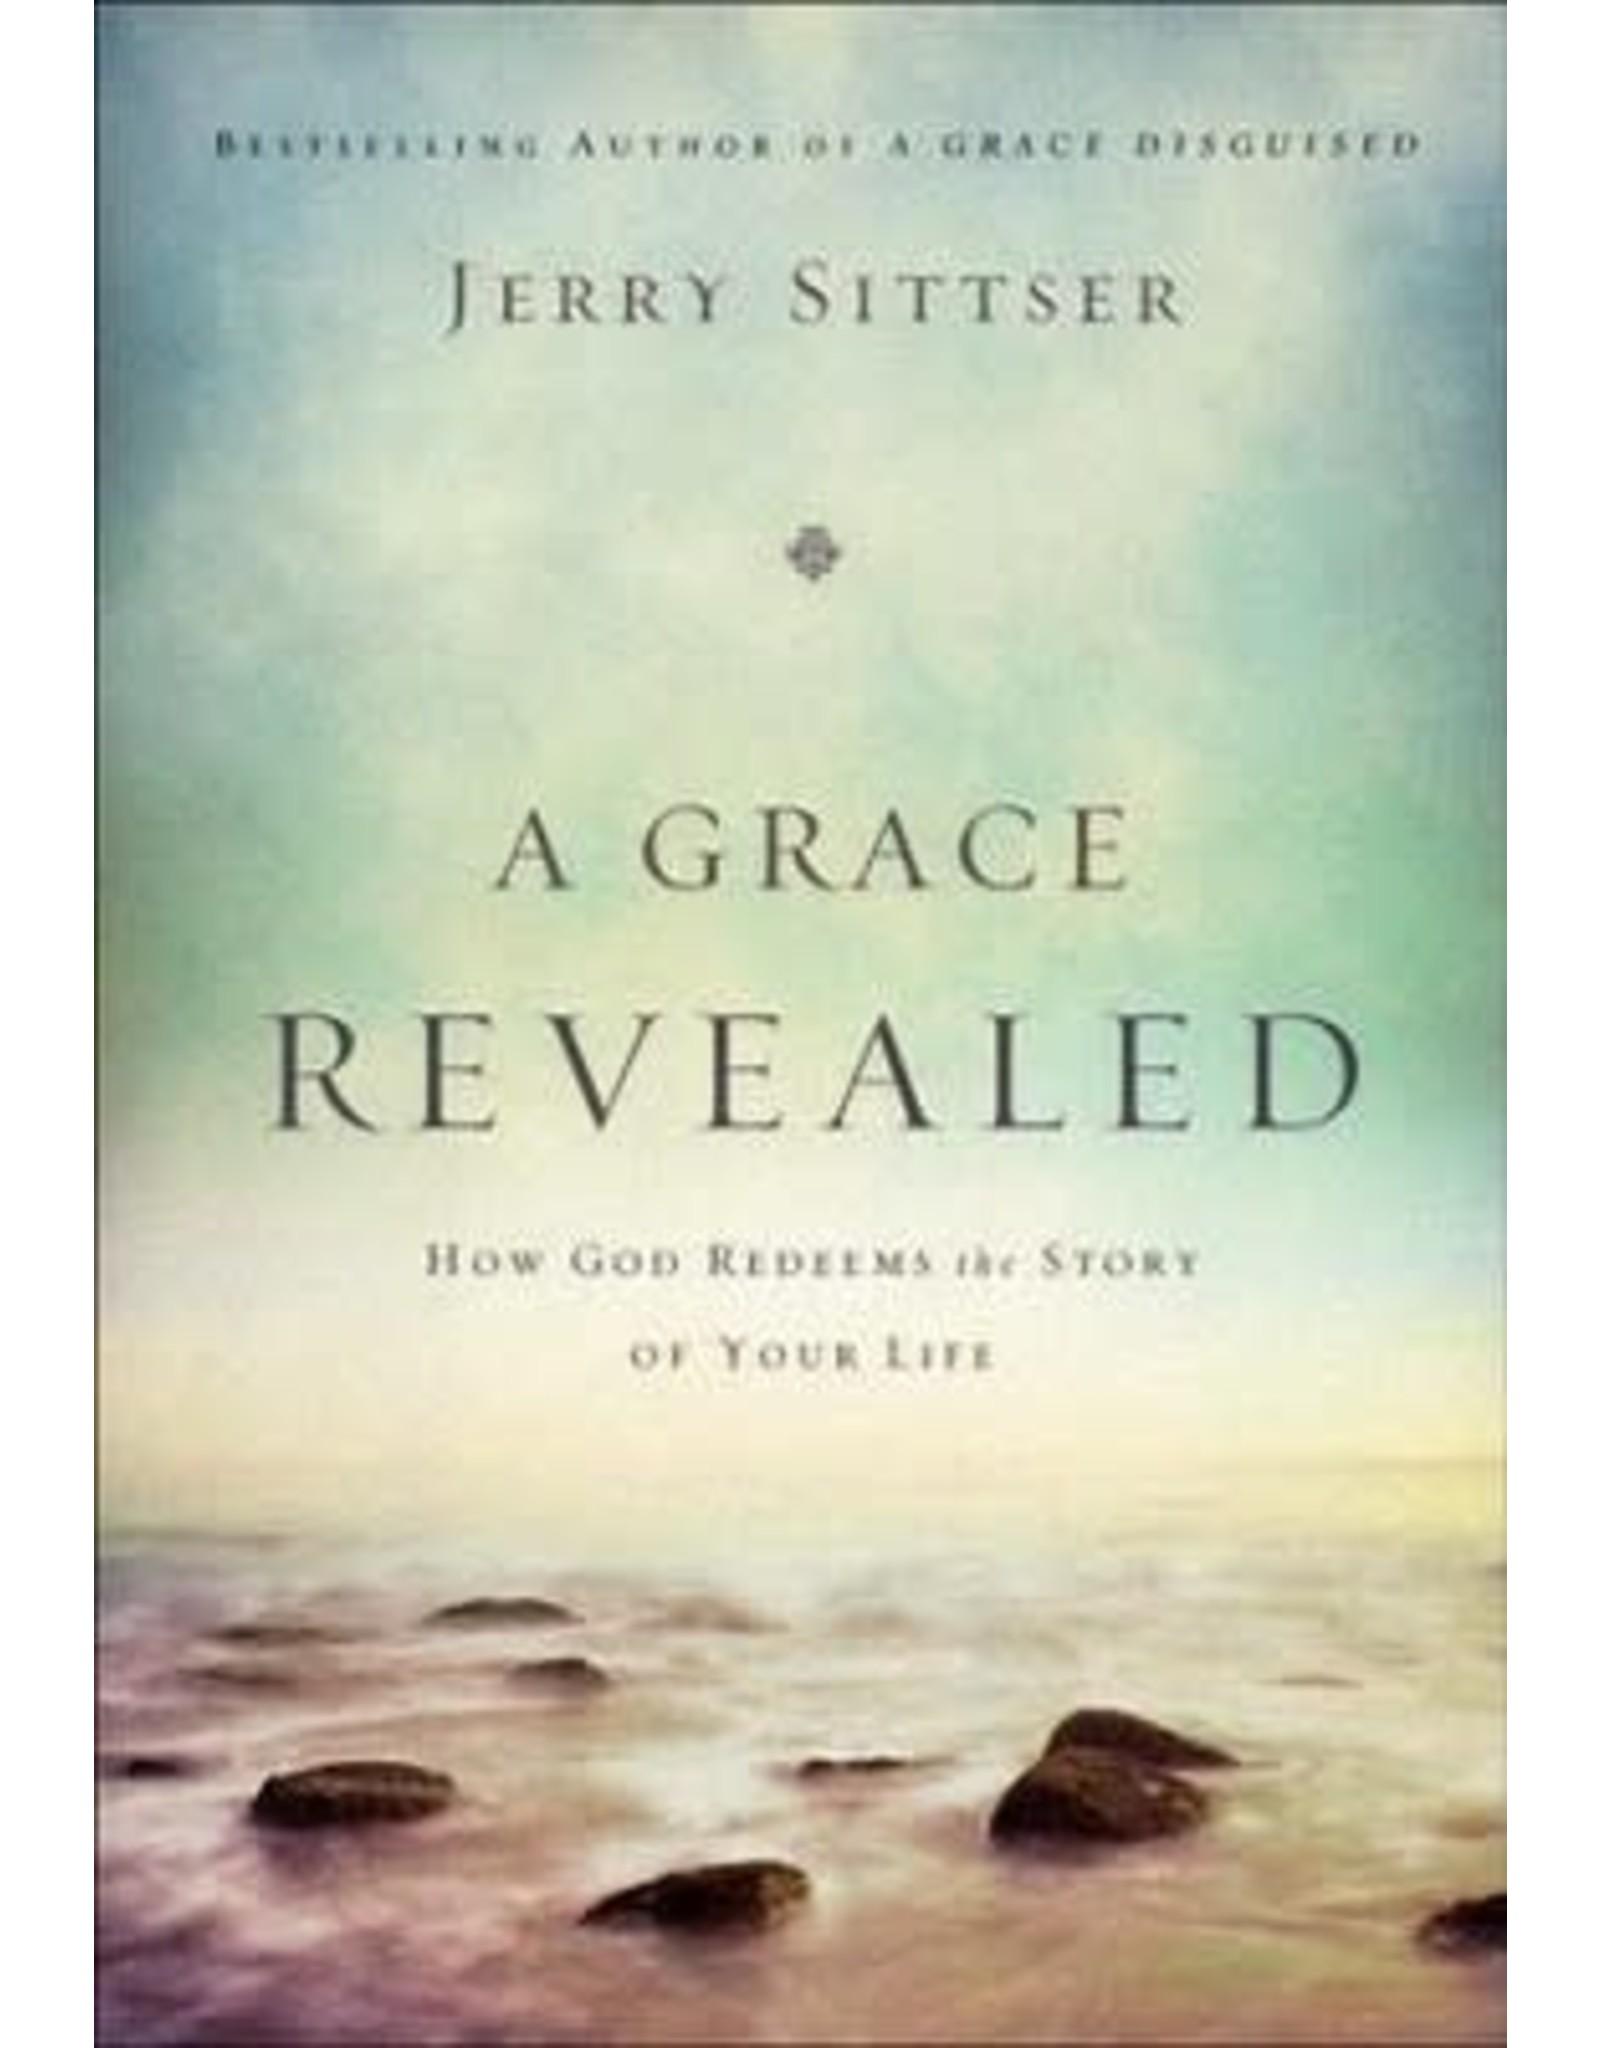 A Grace Revealed by Jerry Sittser